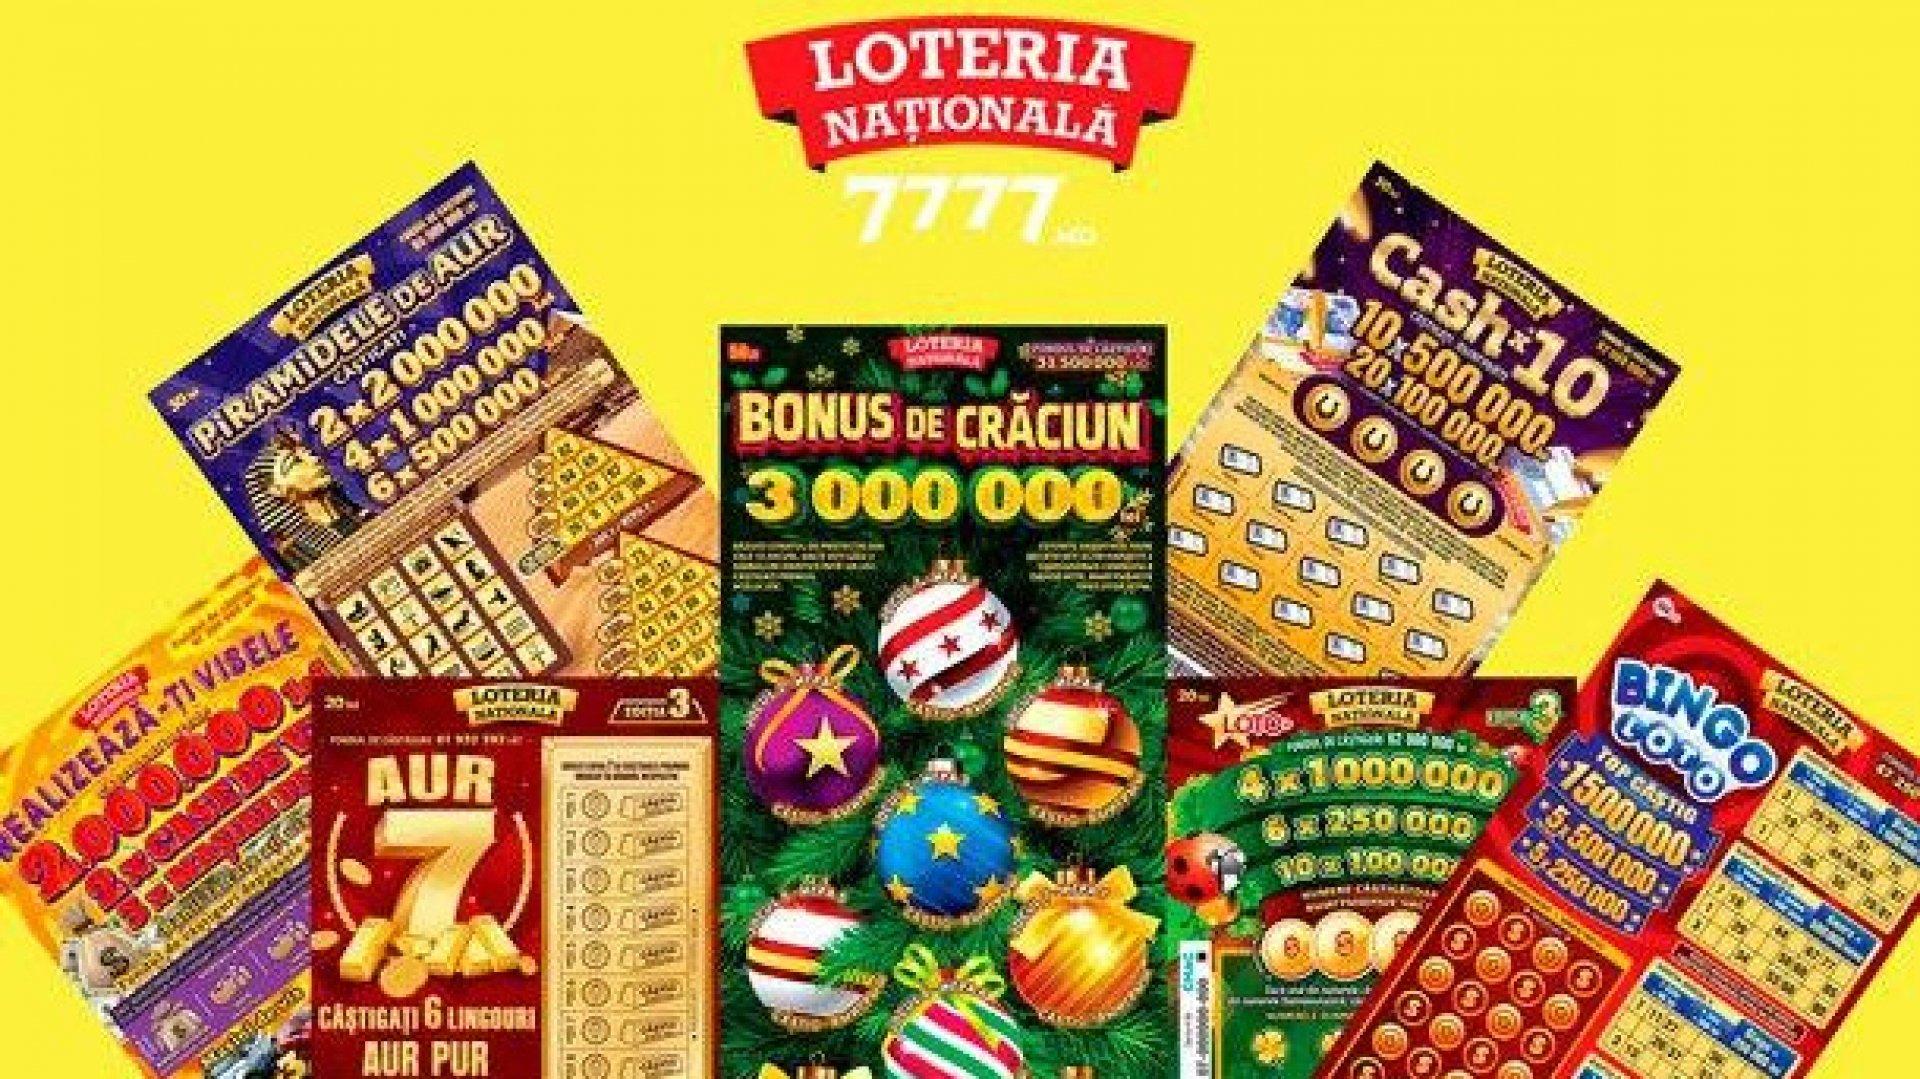 ᐈ золотой кубок ® игровые автоматы онлайн голд кап ? лотерея унл